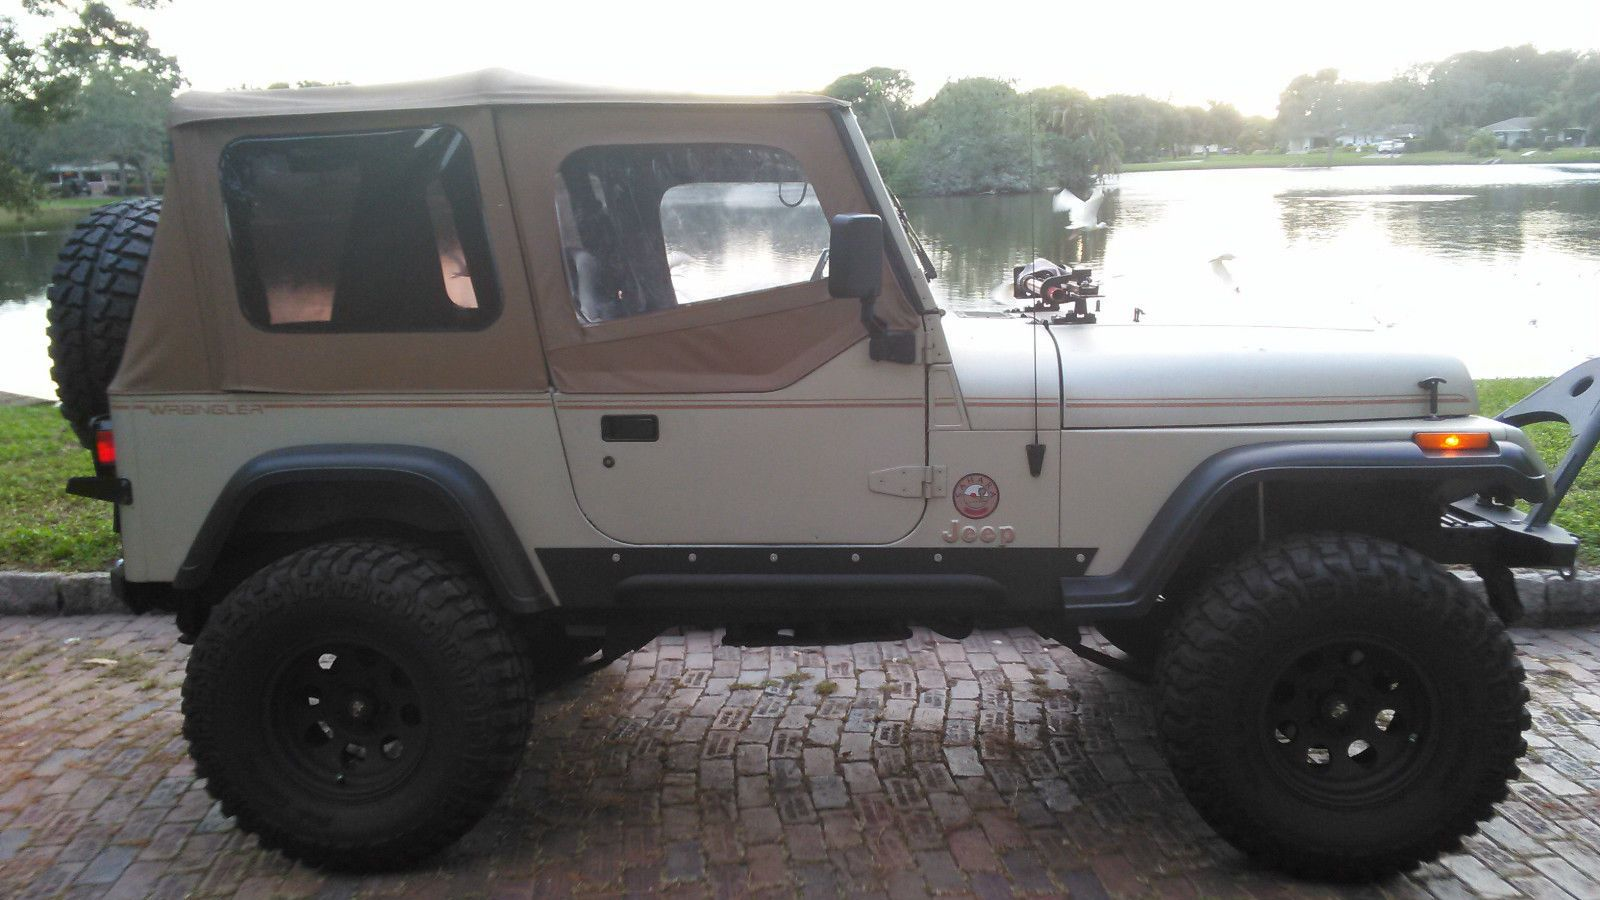 1992 Jeep Wrangler Sahara Sport Utility 2 Door 4 0l Jeep Wrangler Sahara Jeep Wrangler Jeep